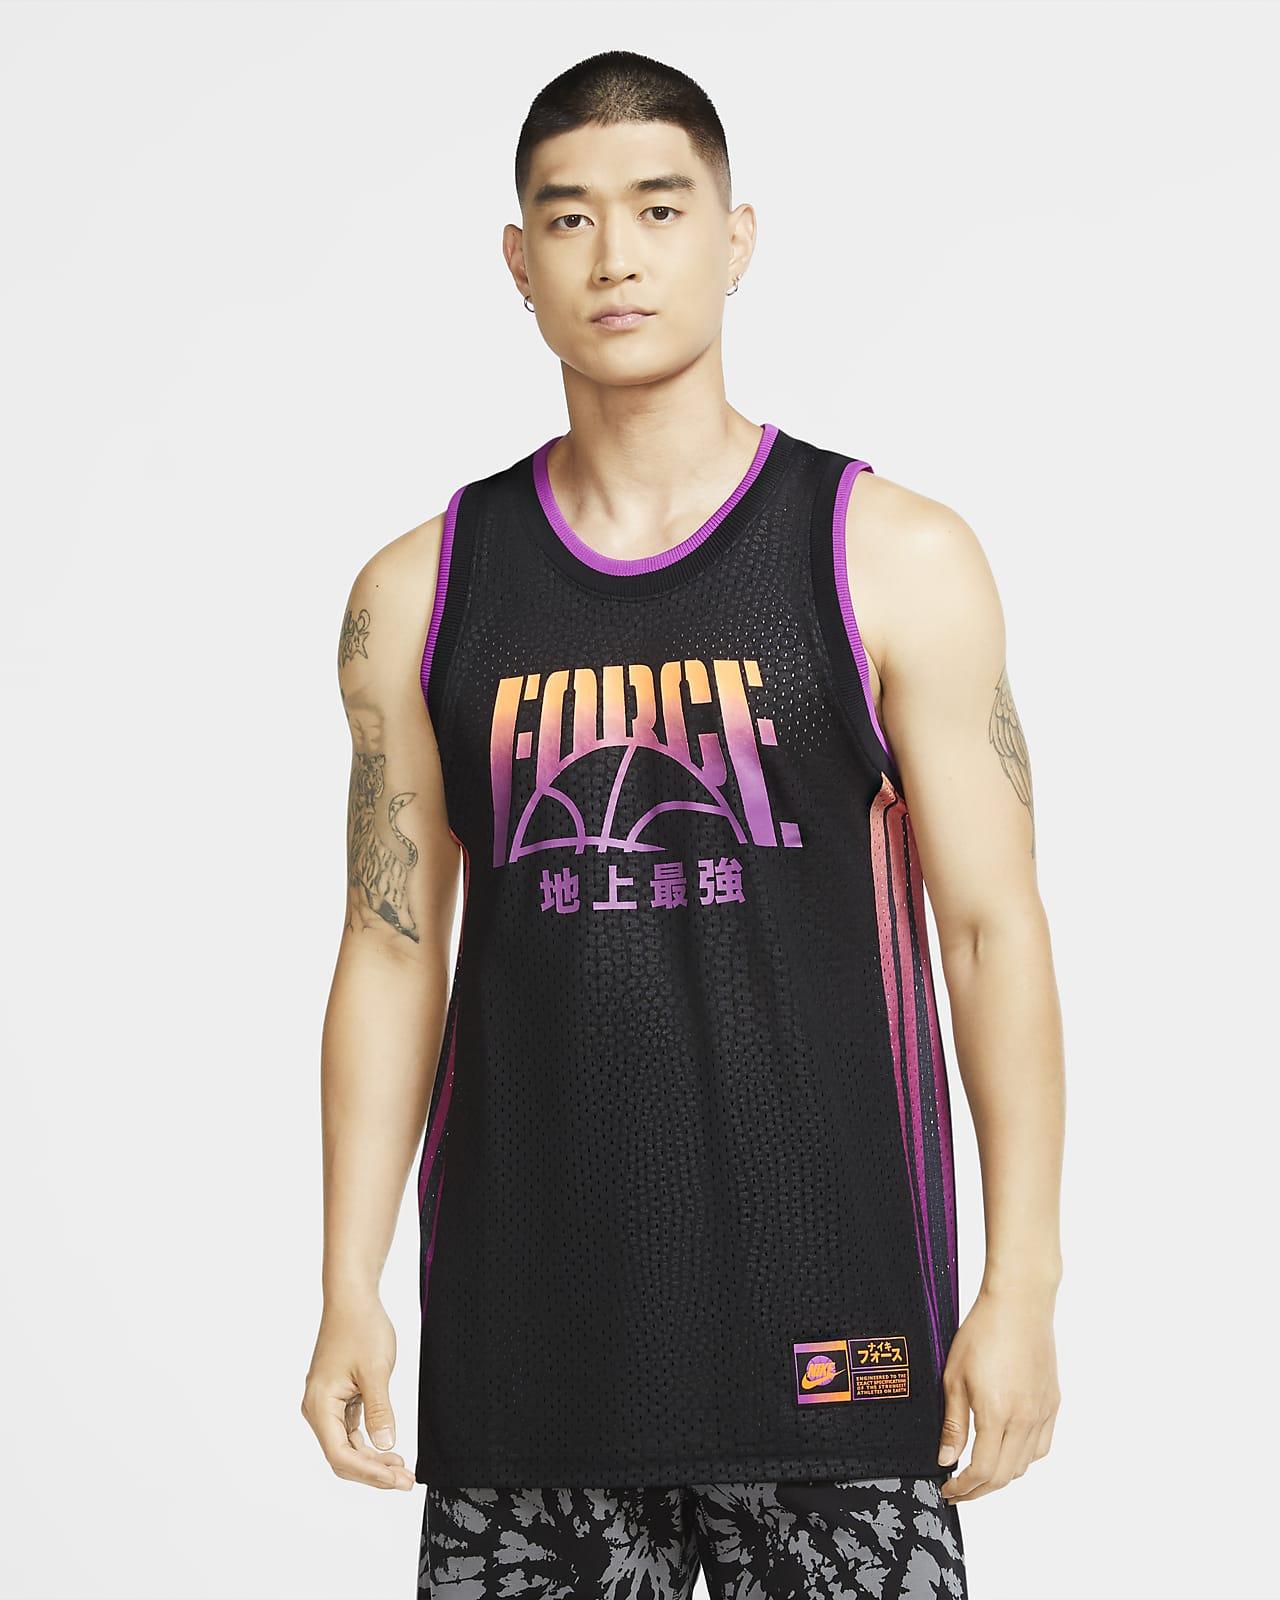 Nike KMA Men's Basketball Jersey